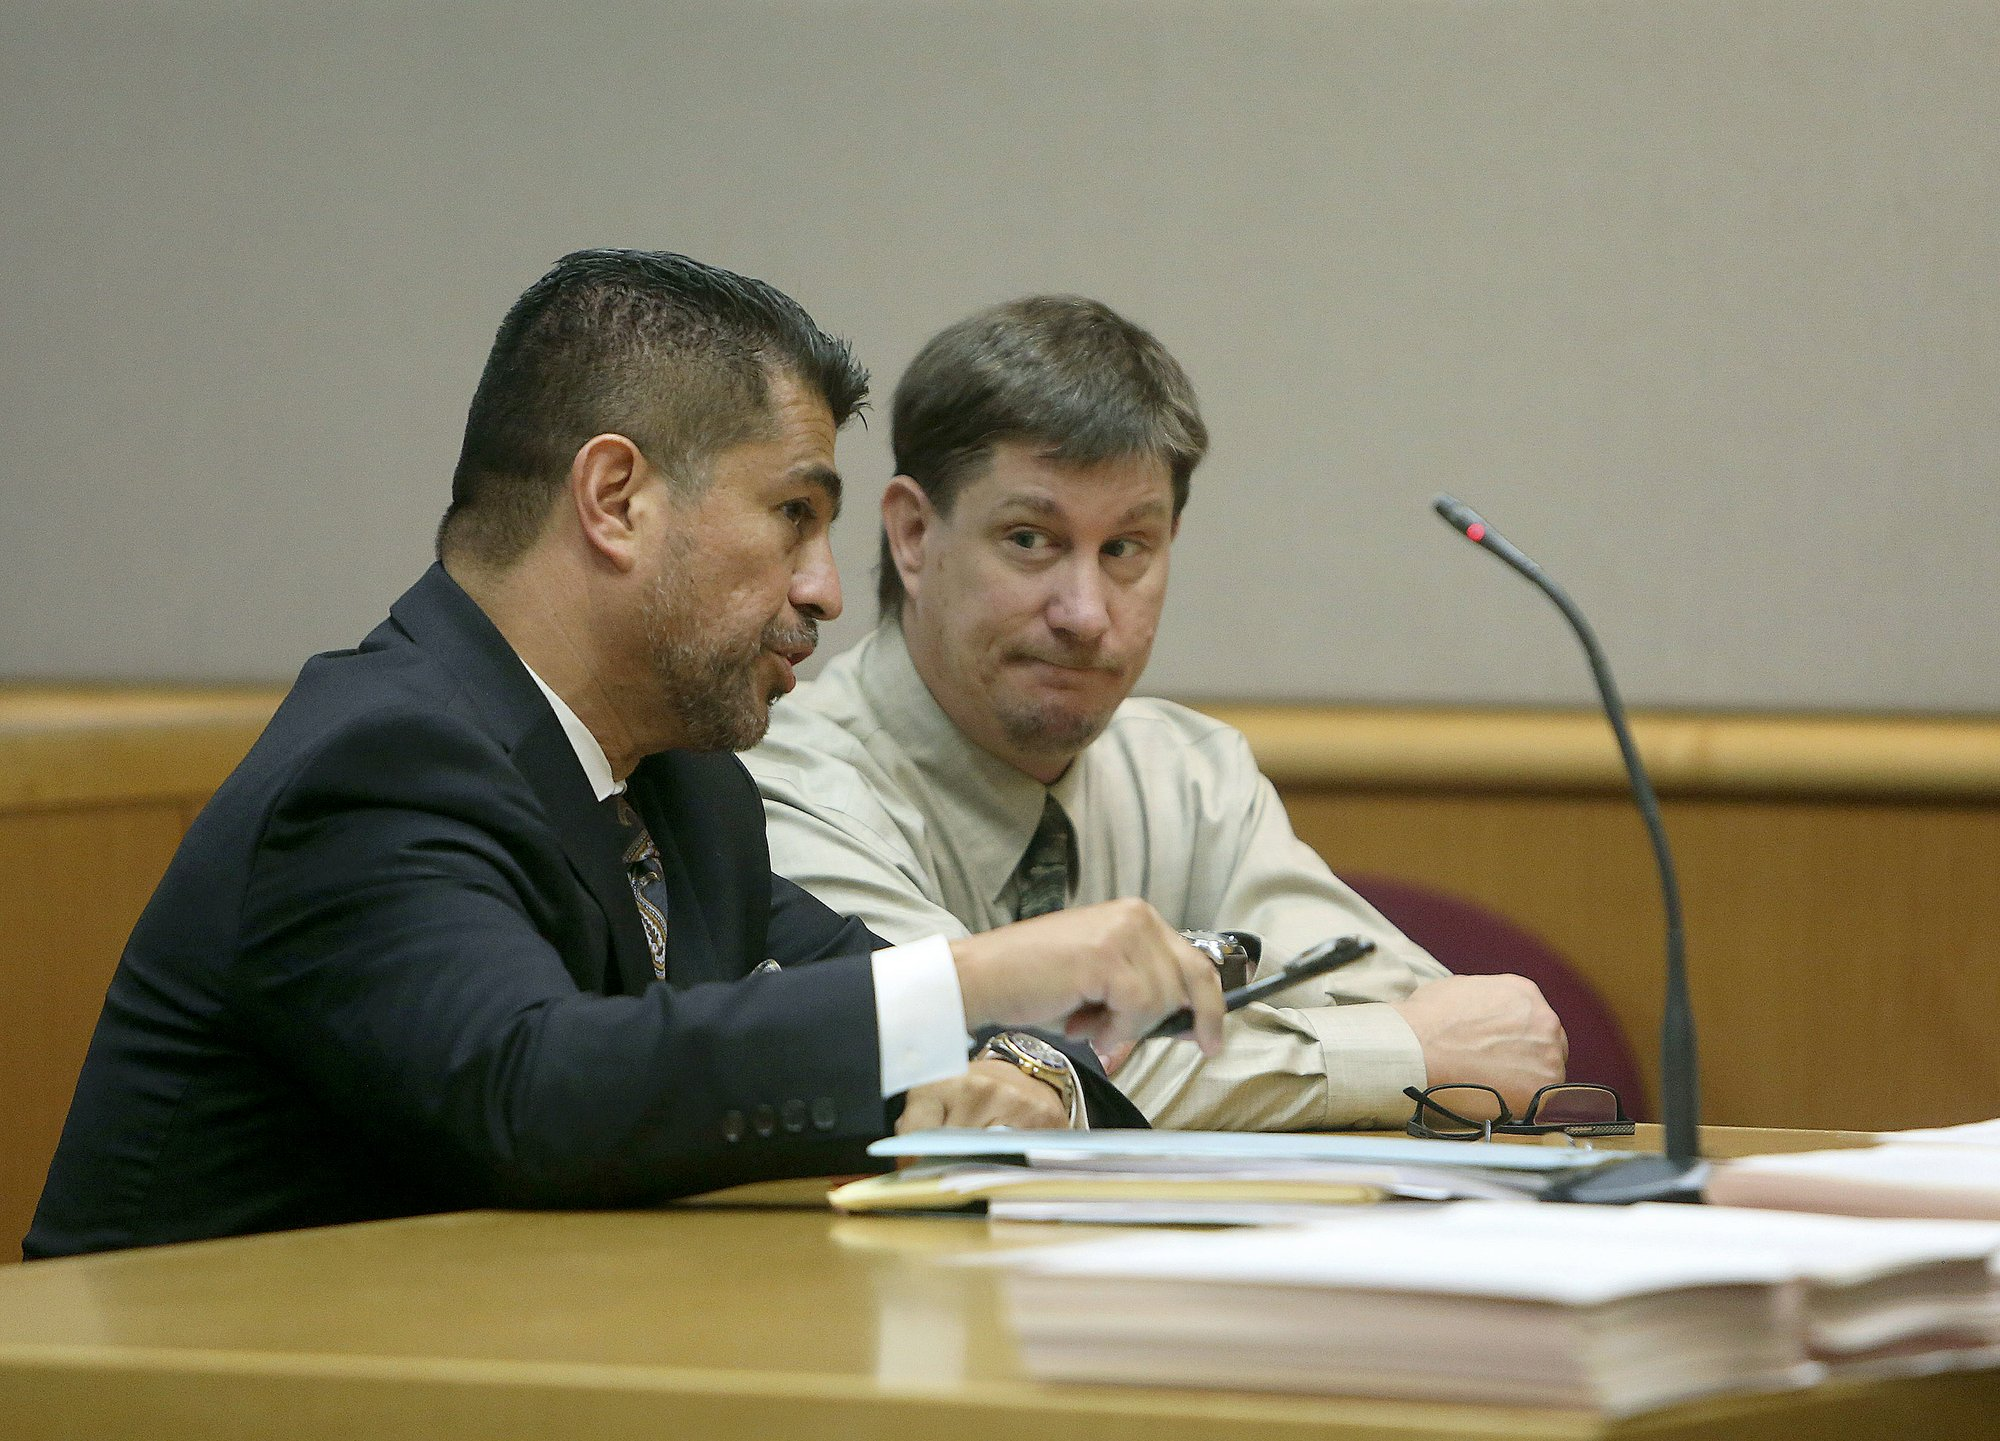 Jury selection begins in Florida parking lot shooting case